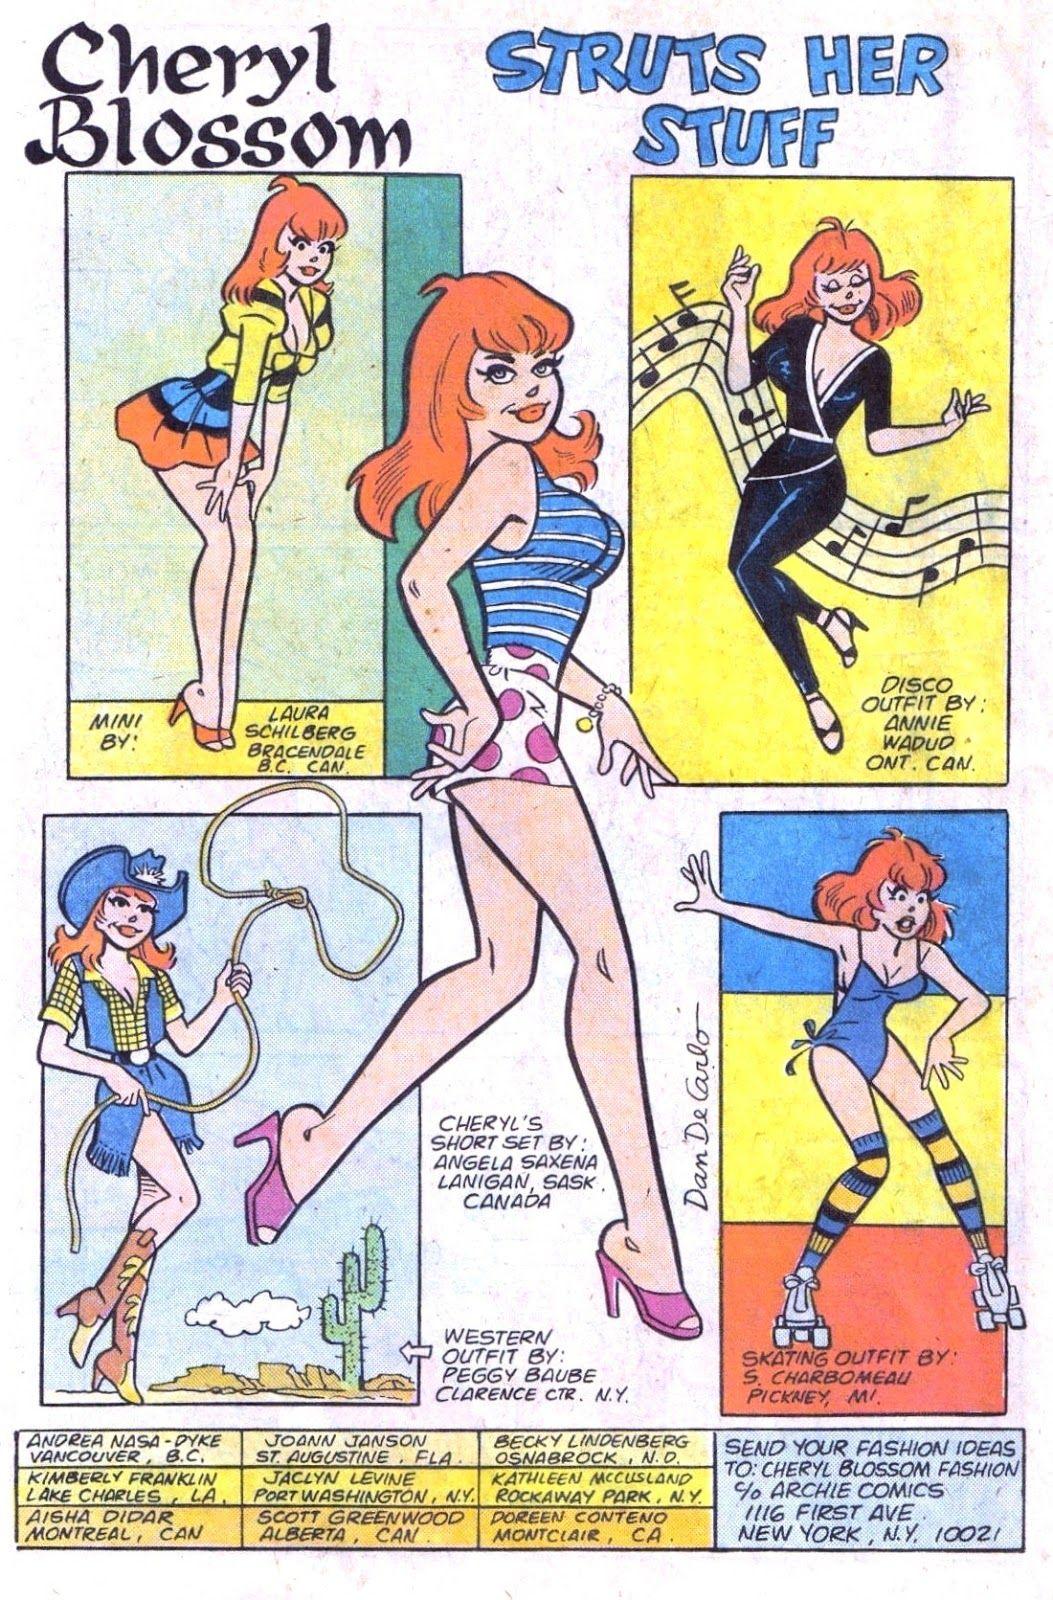 Cvheryl Blossom Cheryl Blossom Archie Comics Cheryl Blossom Comics Archie Comic Books